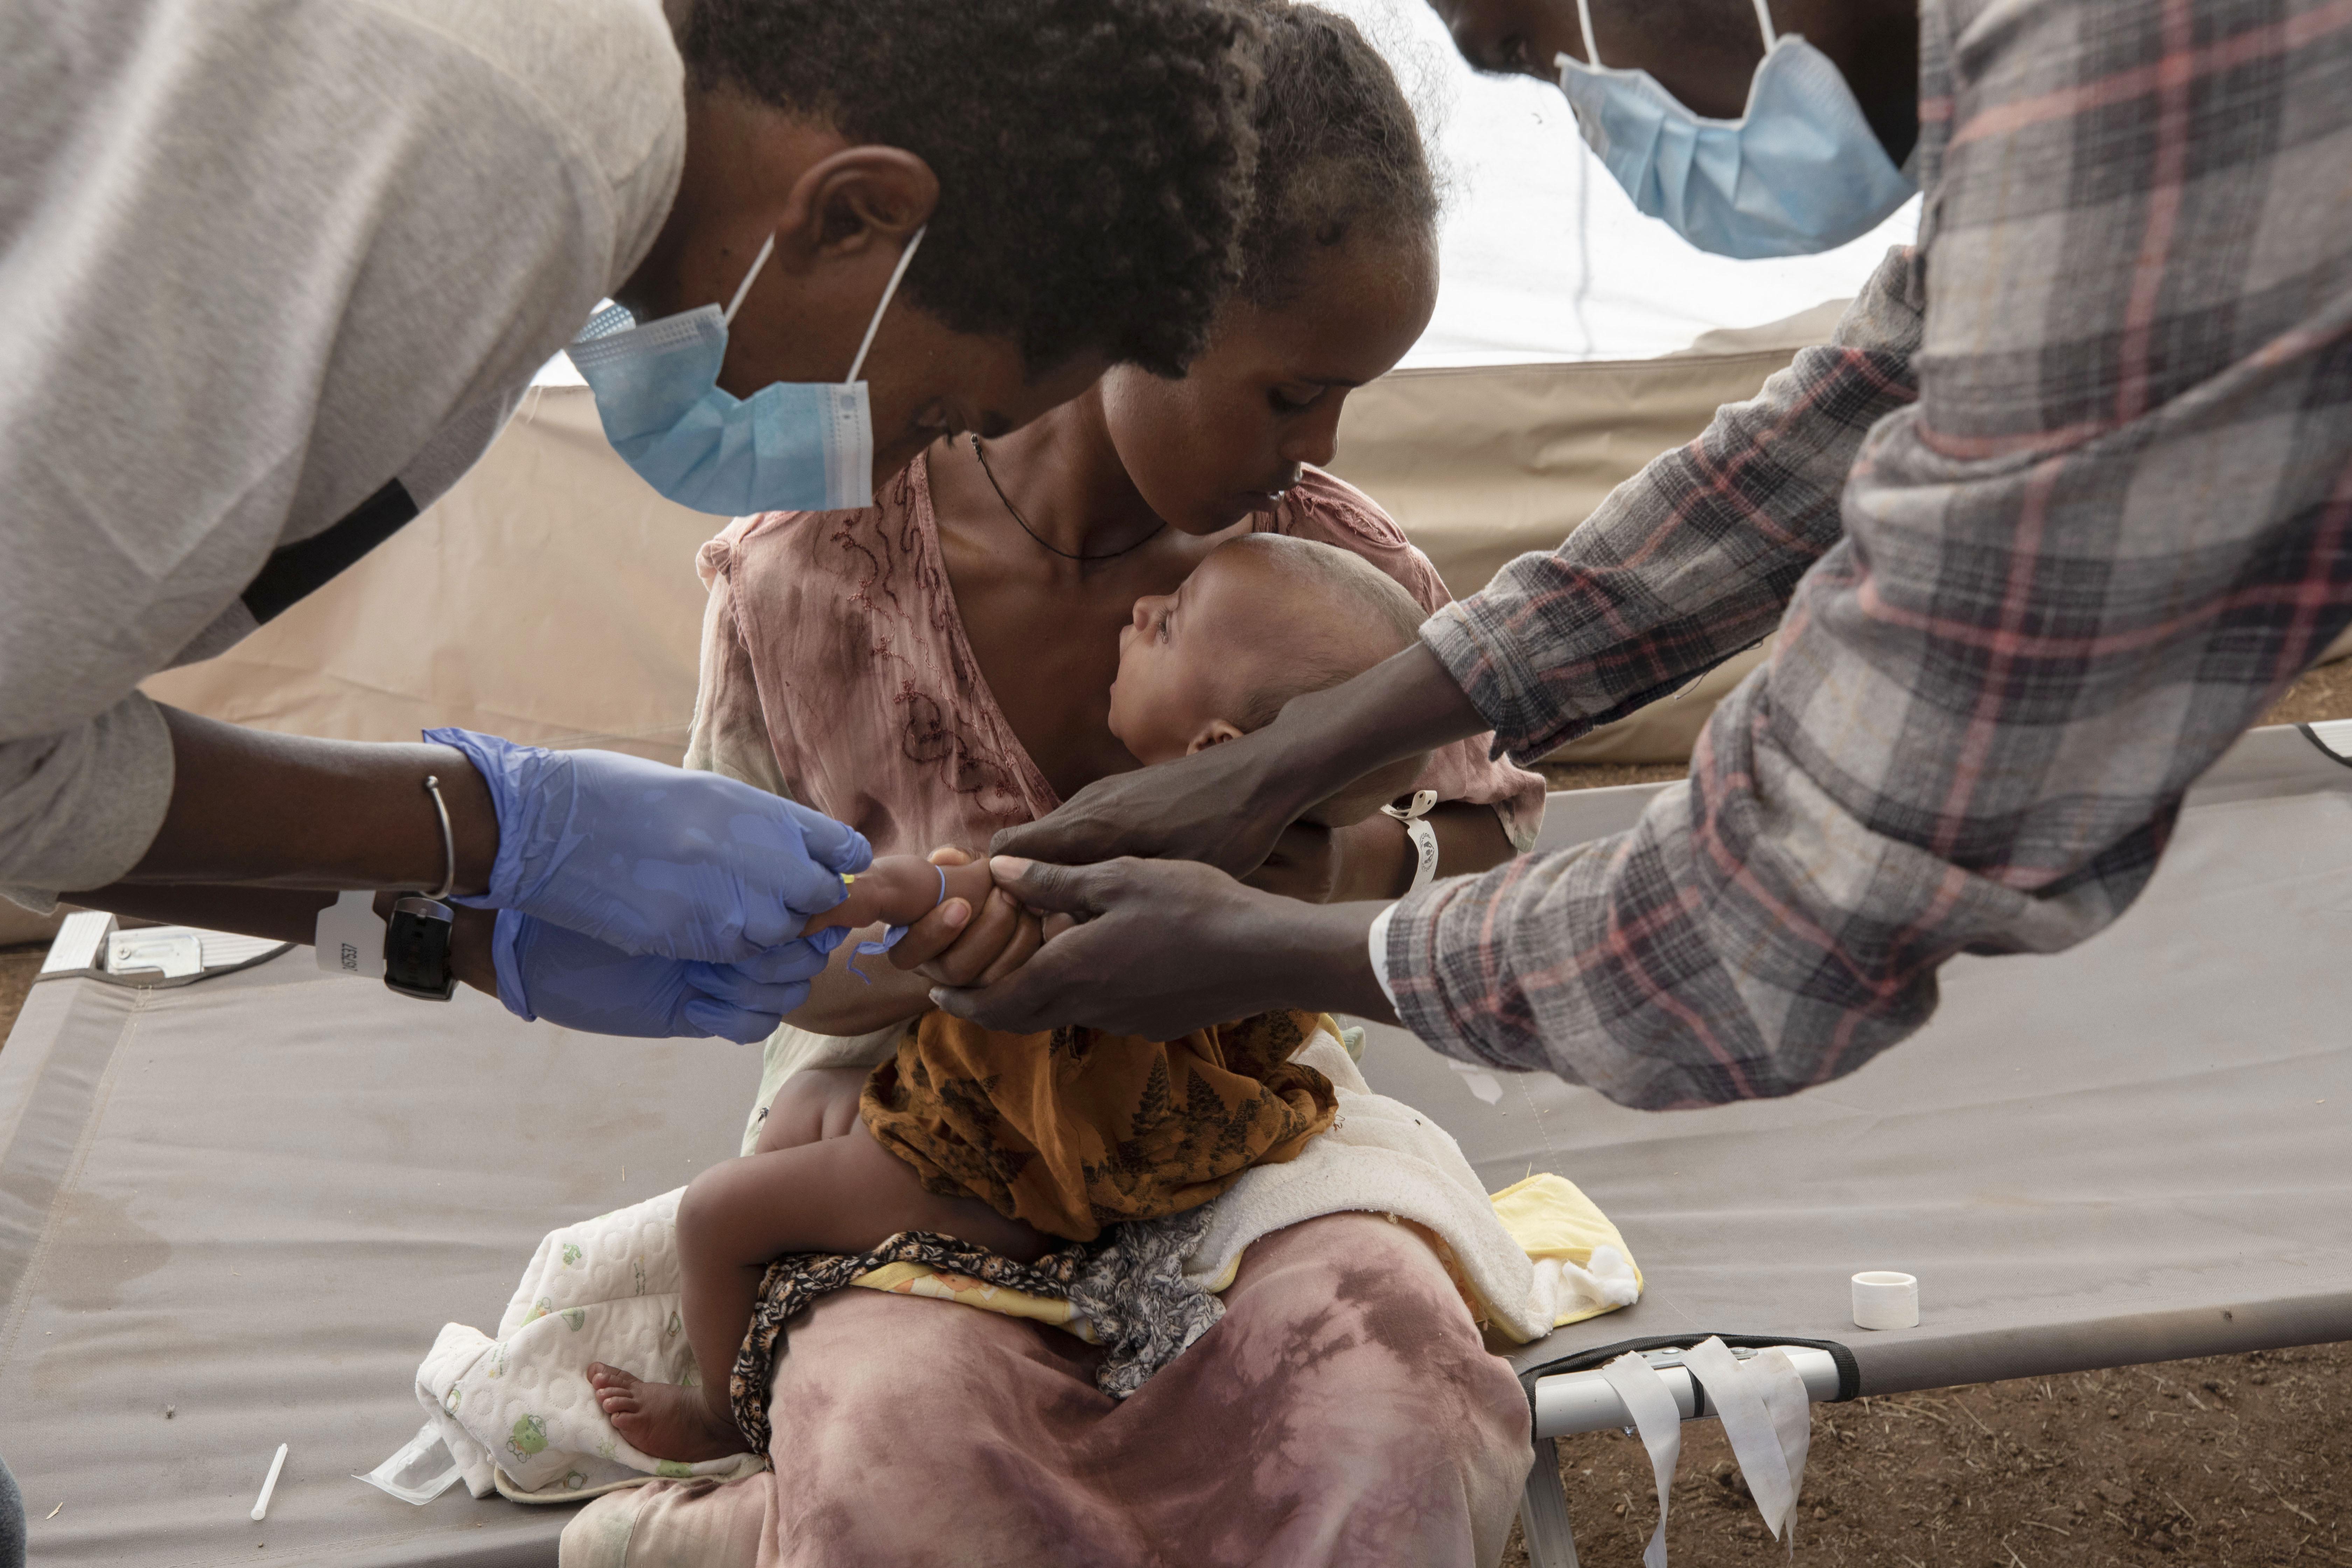 Insecurity prolongs in Ethiopia's Tigray region